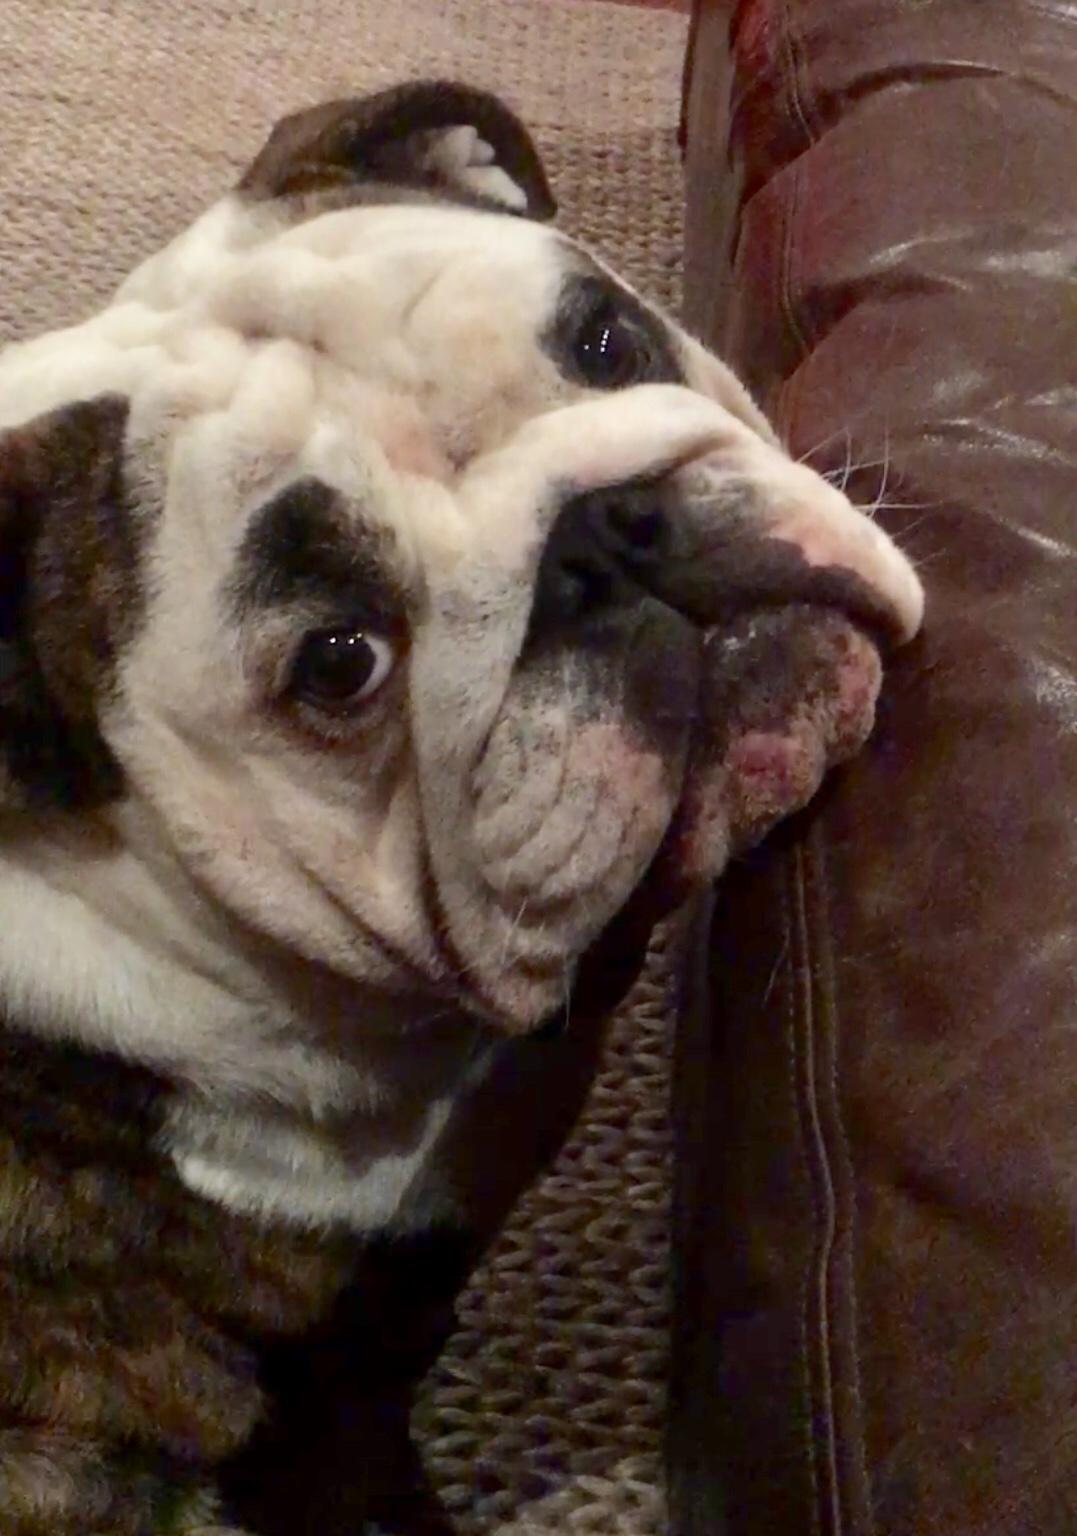 Walter, the English Bulldogpuppy